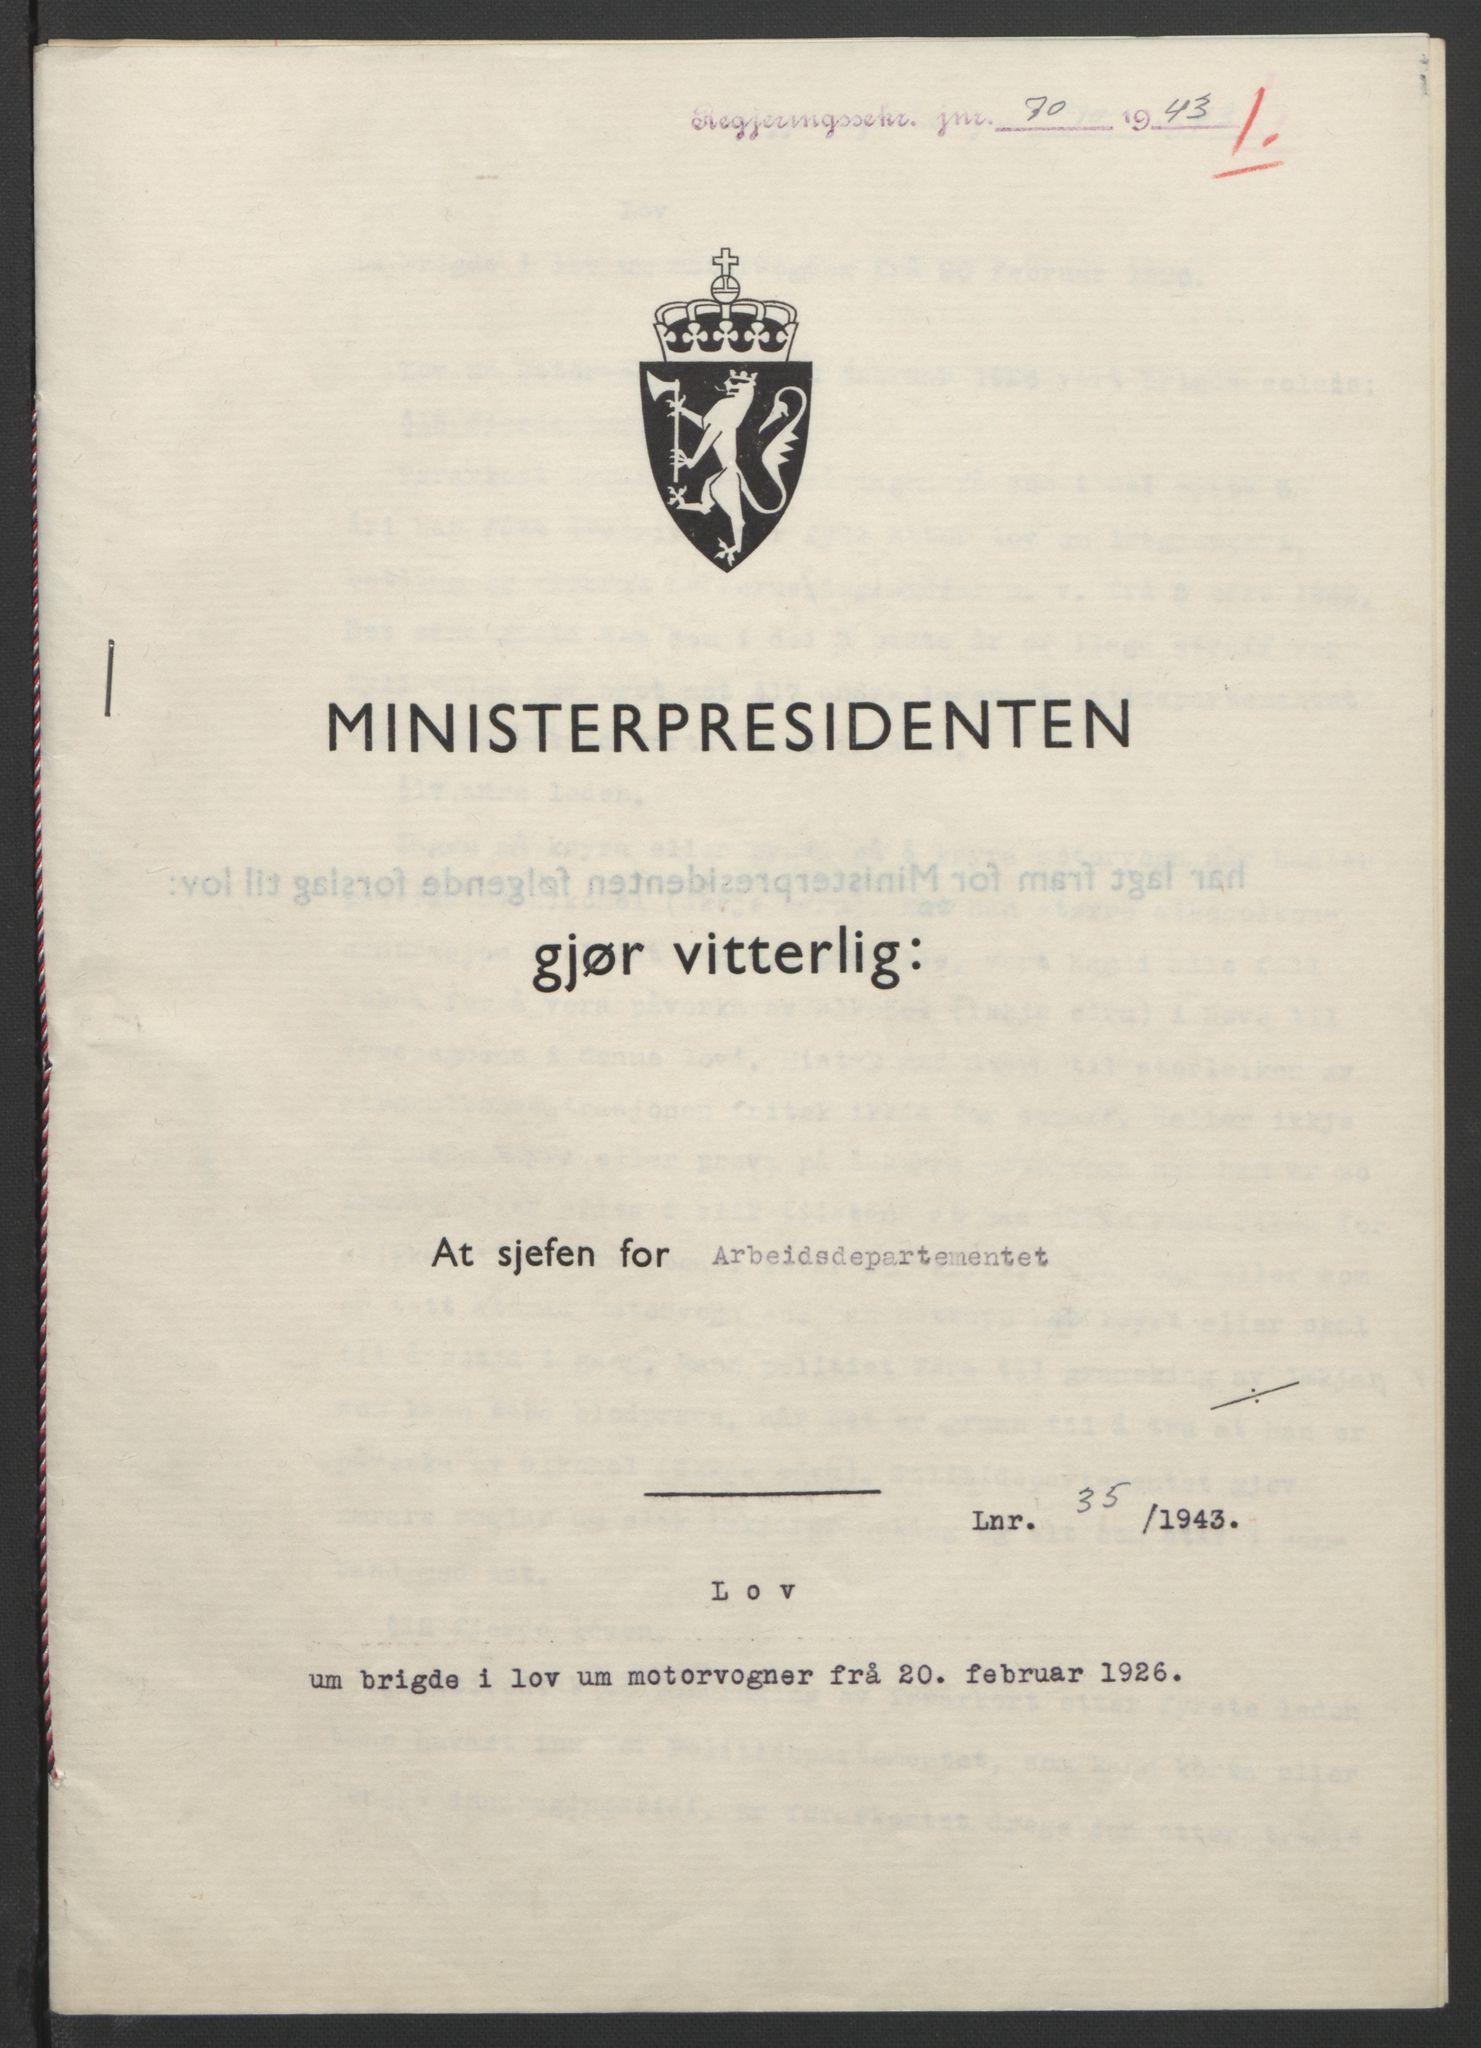 RA, NS-administrasjonen 1940-1945 (Statsrådsekretariatet, de kommisariske statsråder mm), D/Db/L0099: Lover, 1943, s. 146